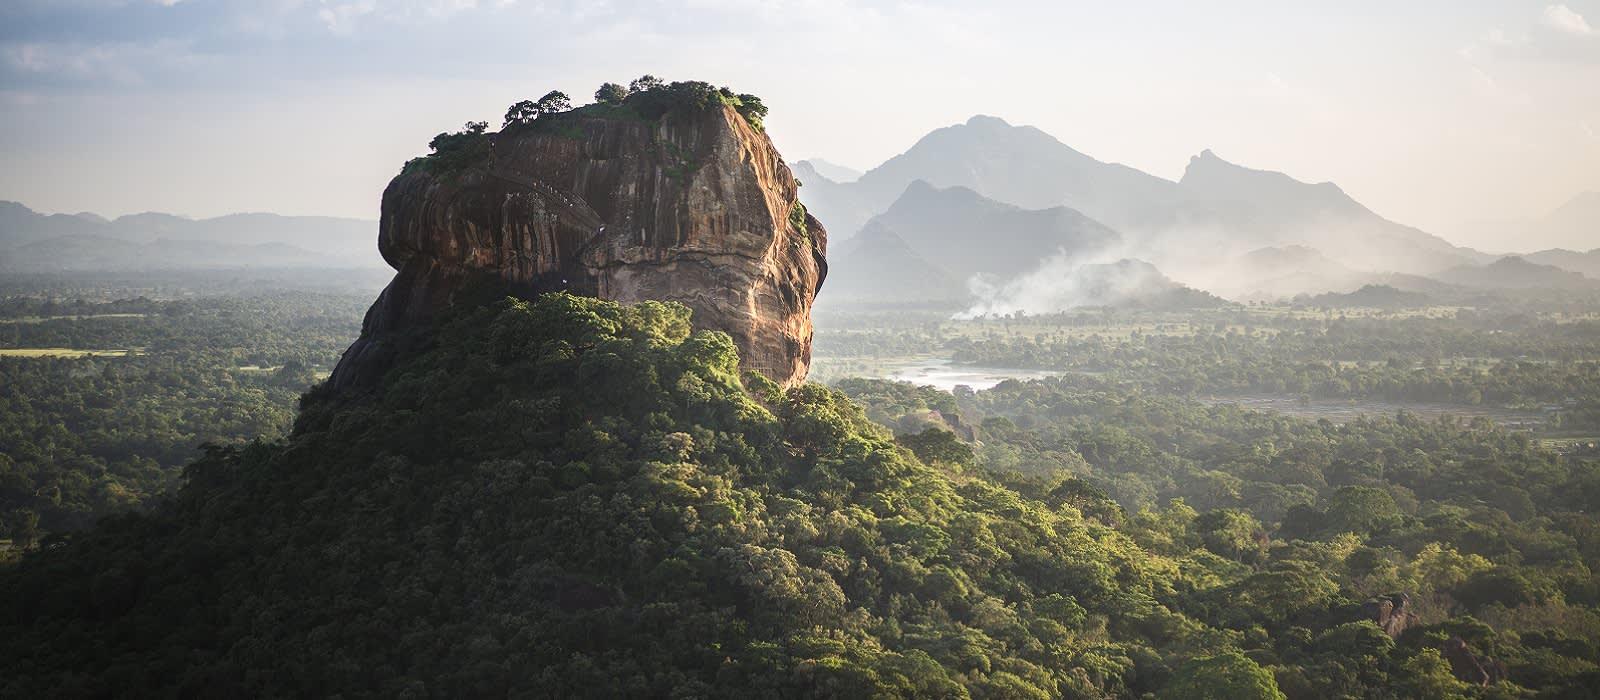 Sigiriya Lion Rock fortress and landscape in Sri Lanka. - Ideal for winter travel